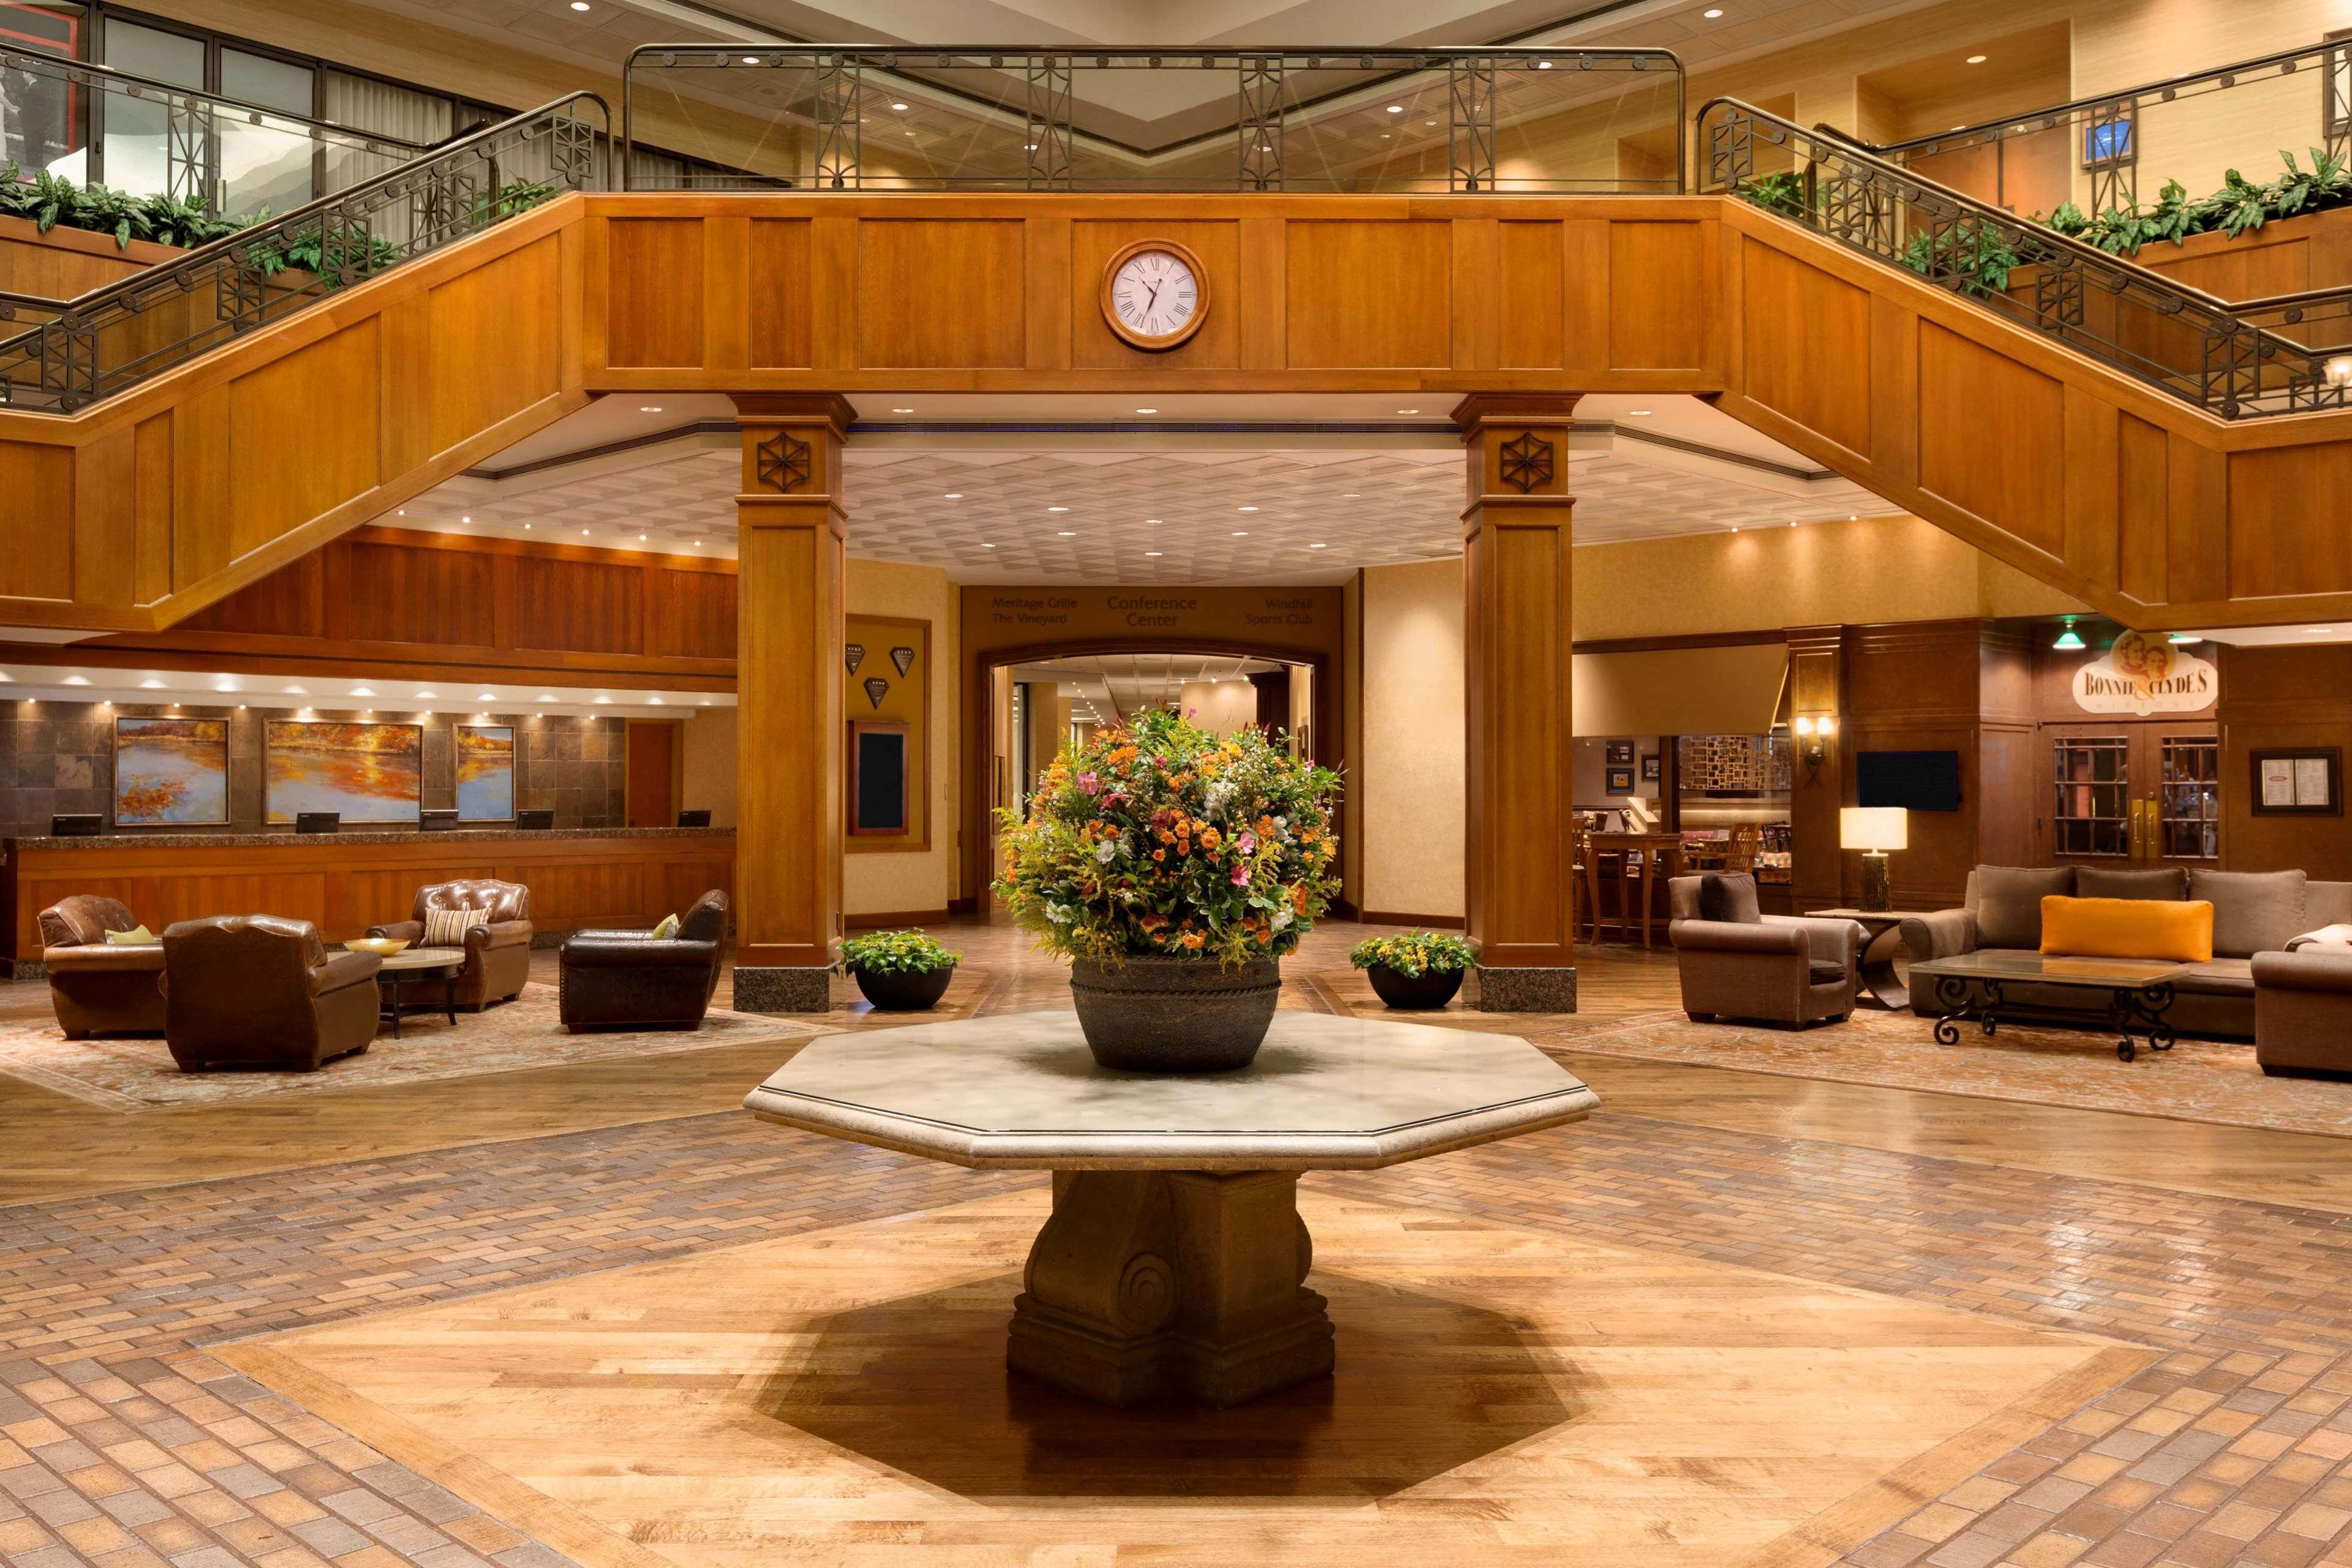 Hilton DFW Lakes Executive Conference Center image 3